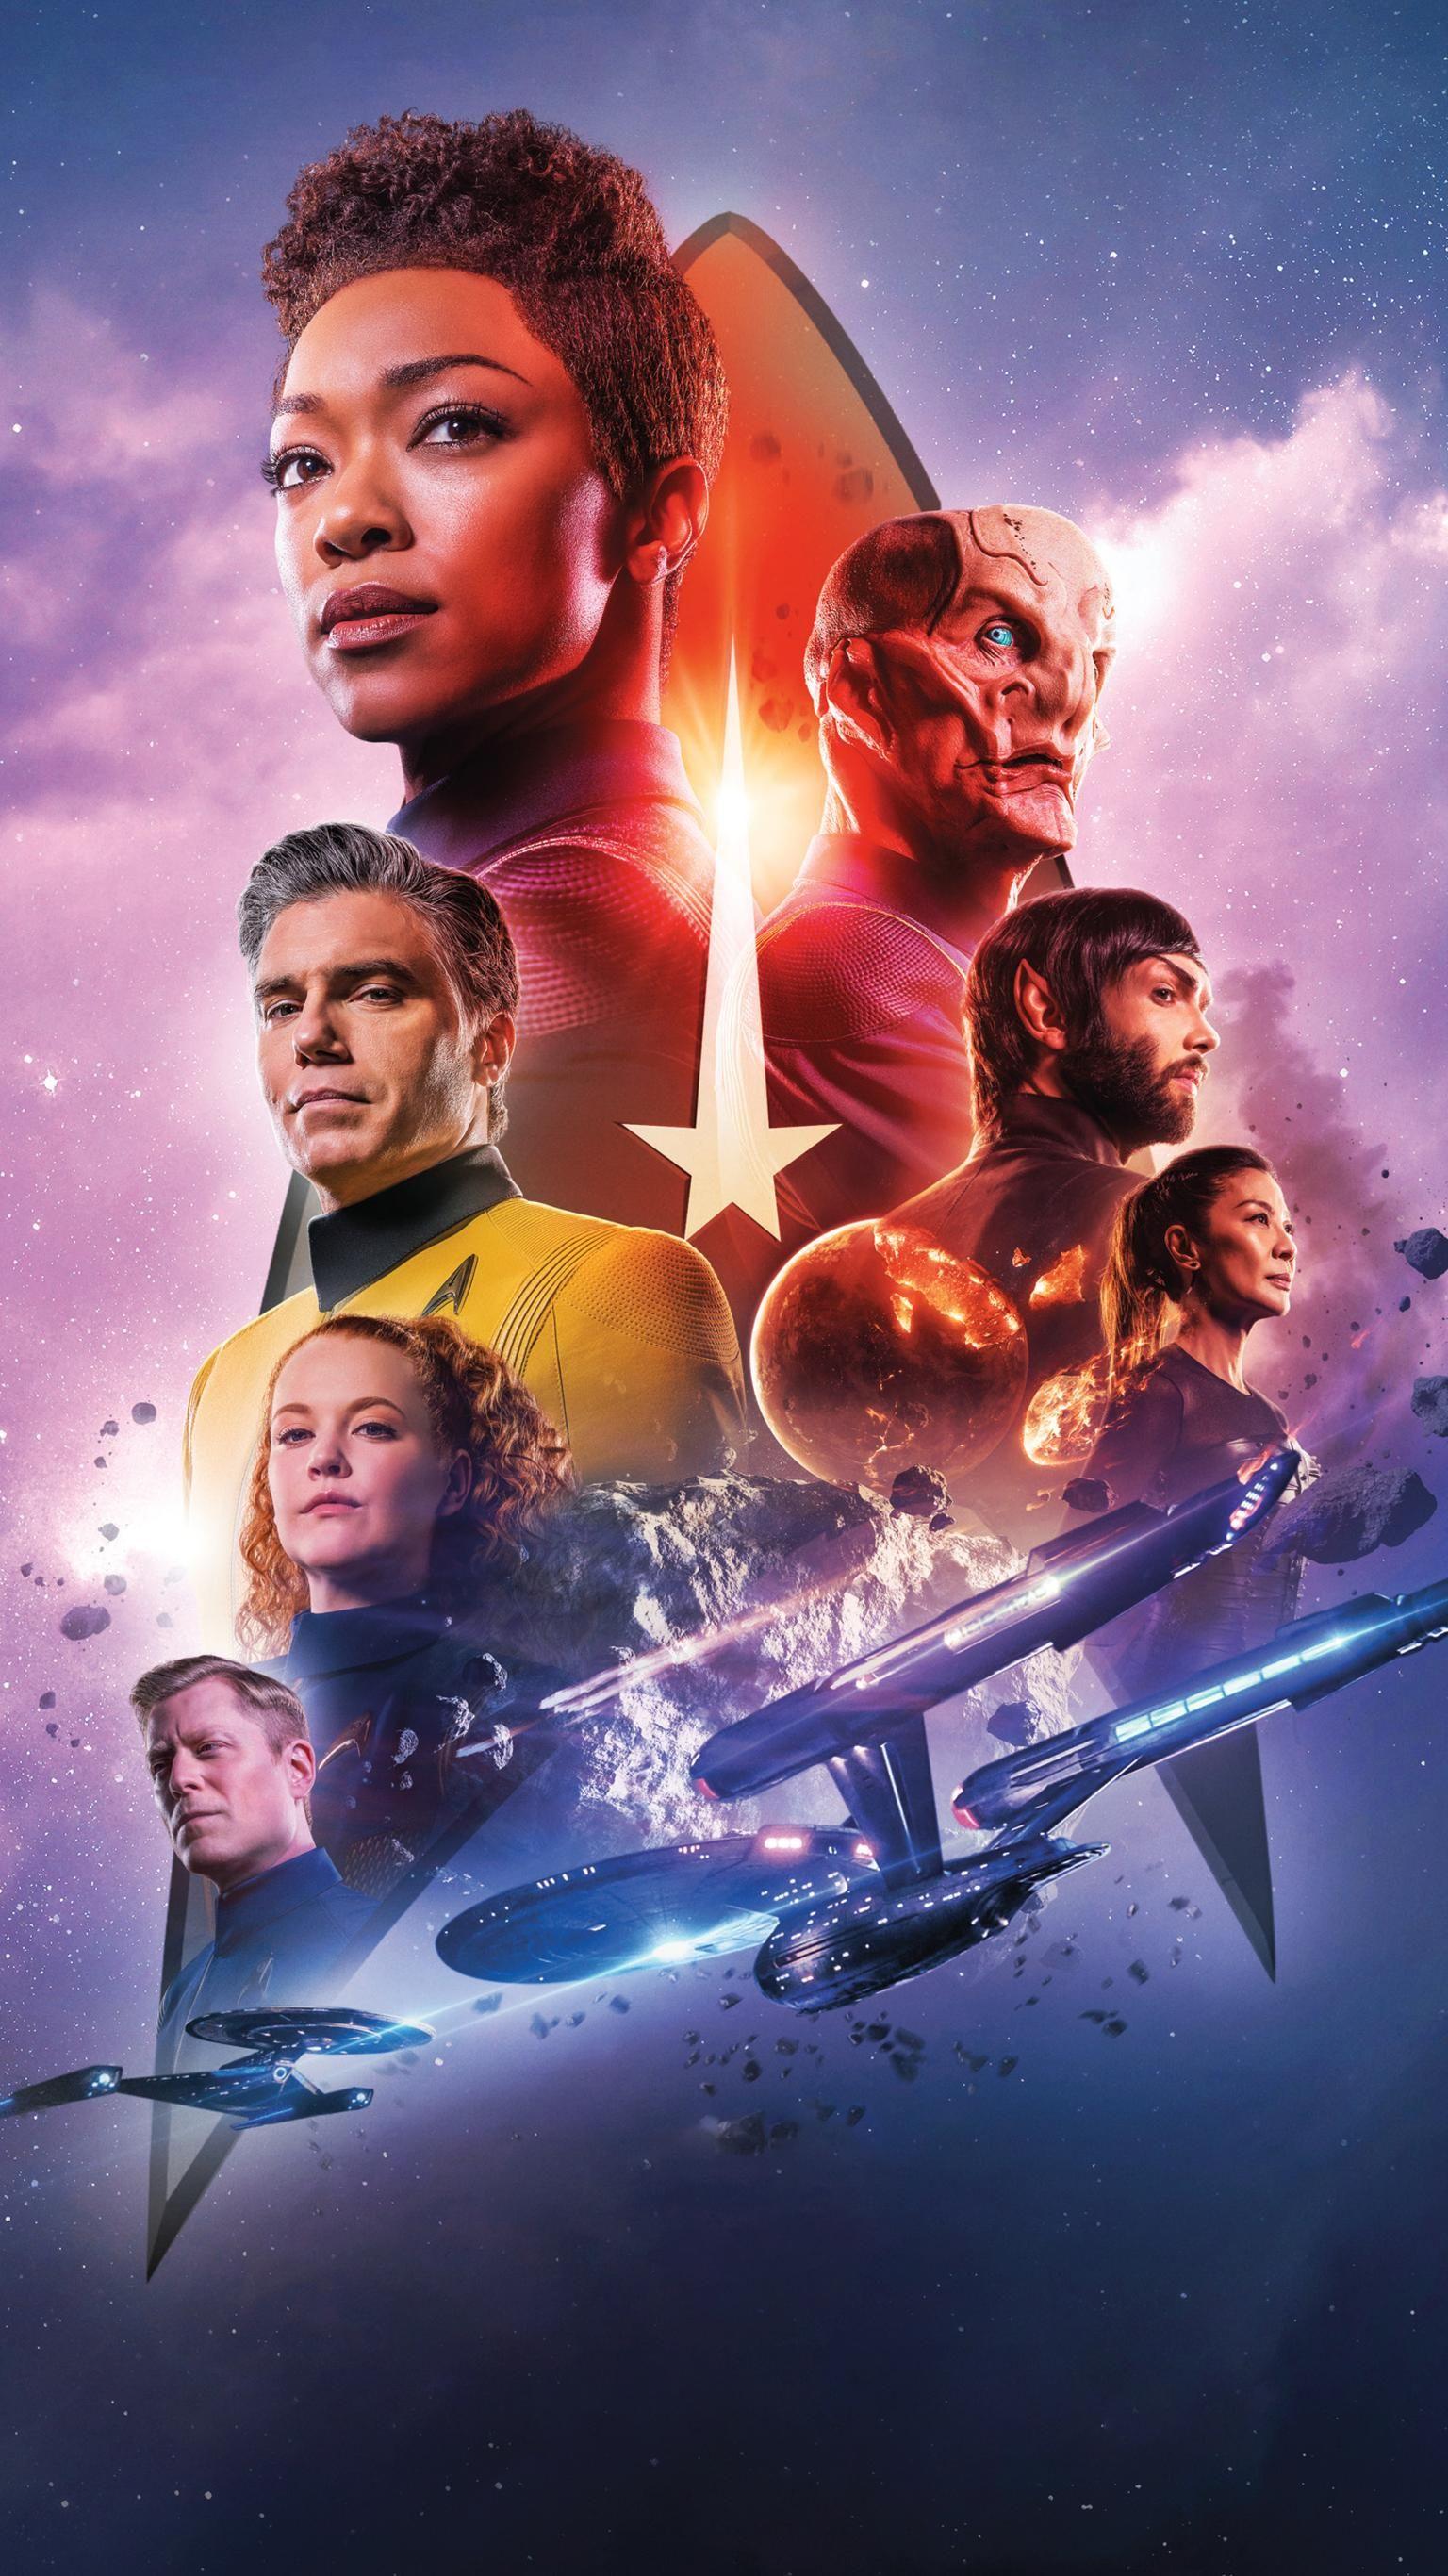 Star Trek Discovery Phone Wallpaper Moviemania Star Trek Movies Star Trek Cast Star Trek Discovery Ship